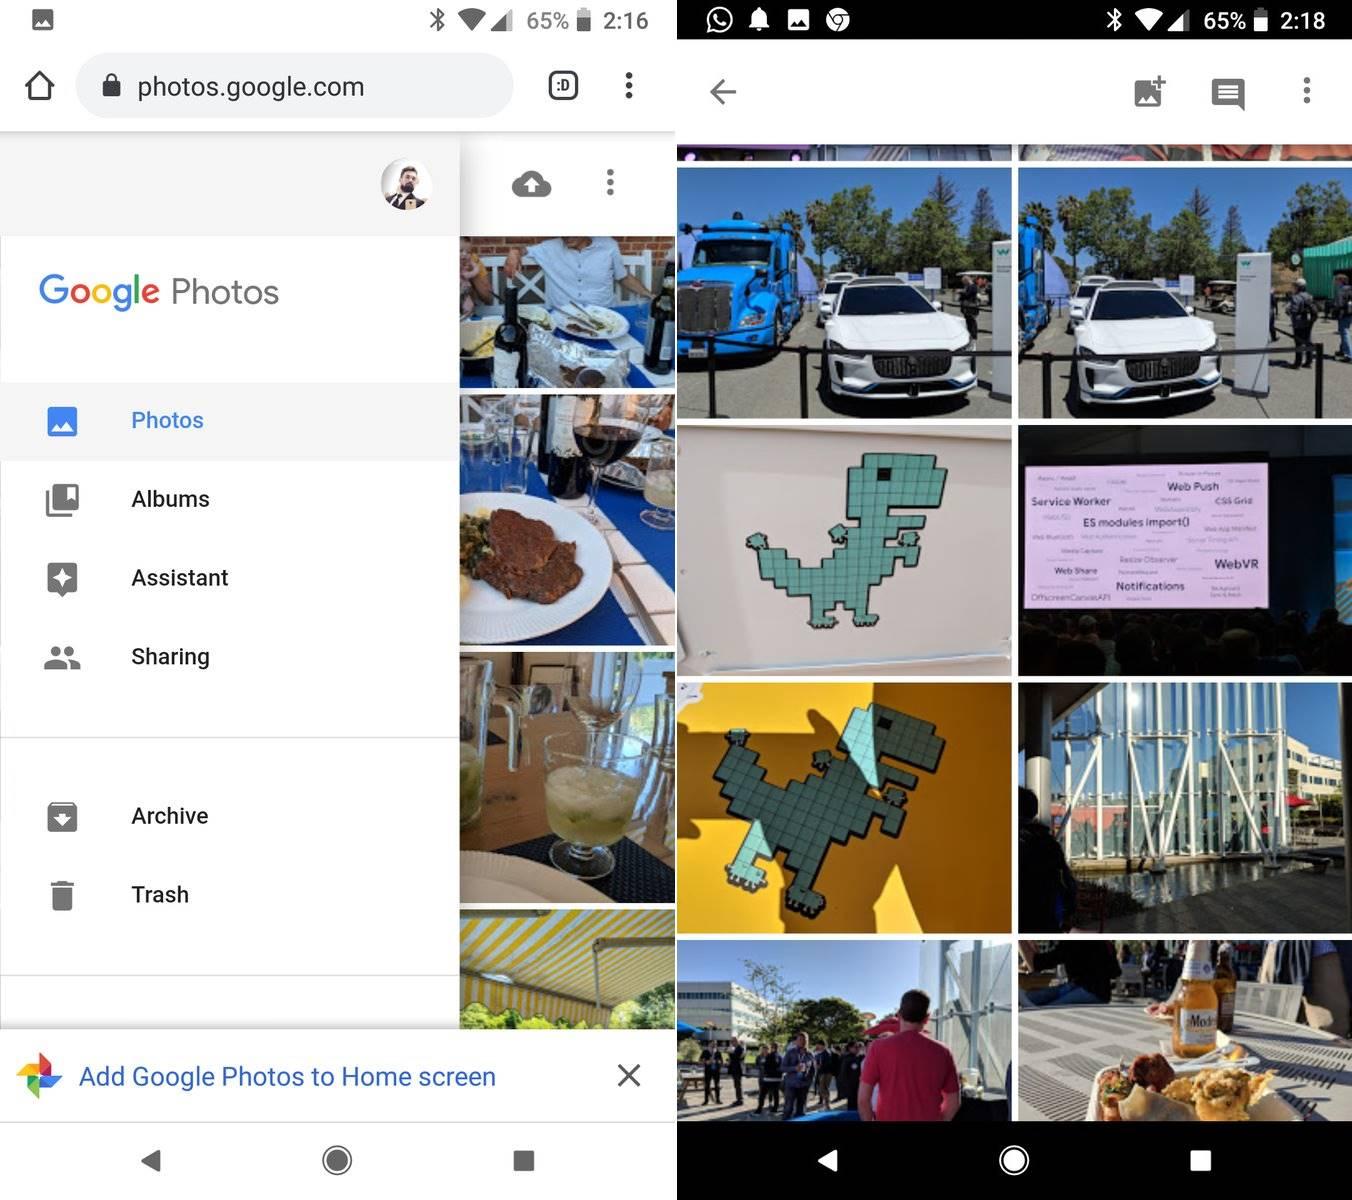 Google Photos Schimbarea MAJORA Lansata 1